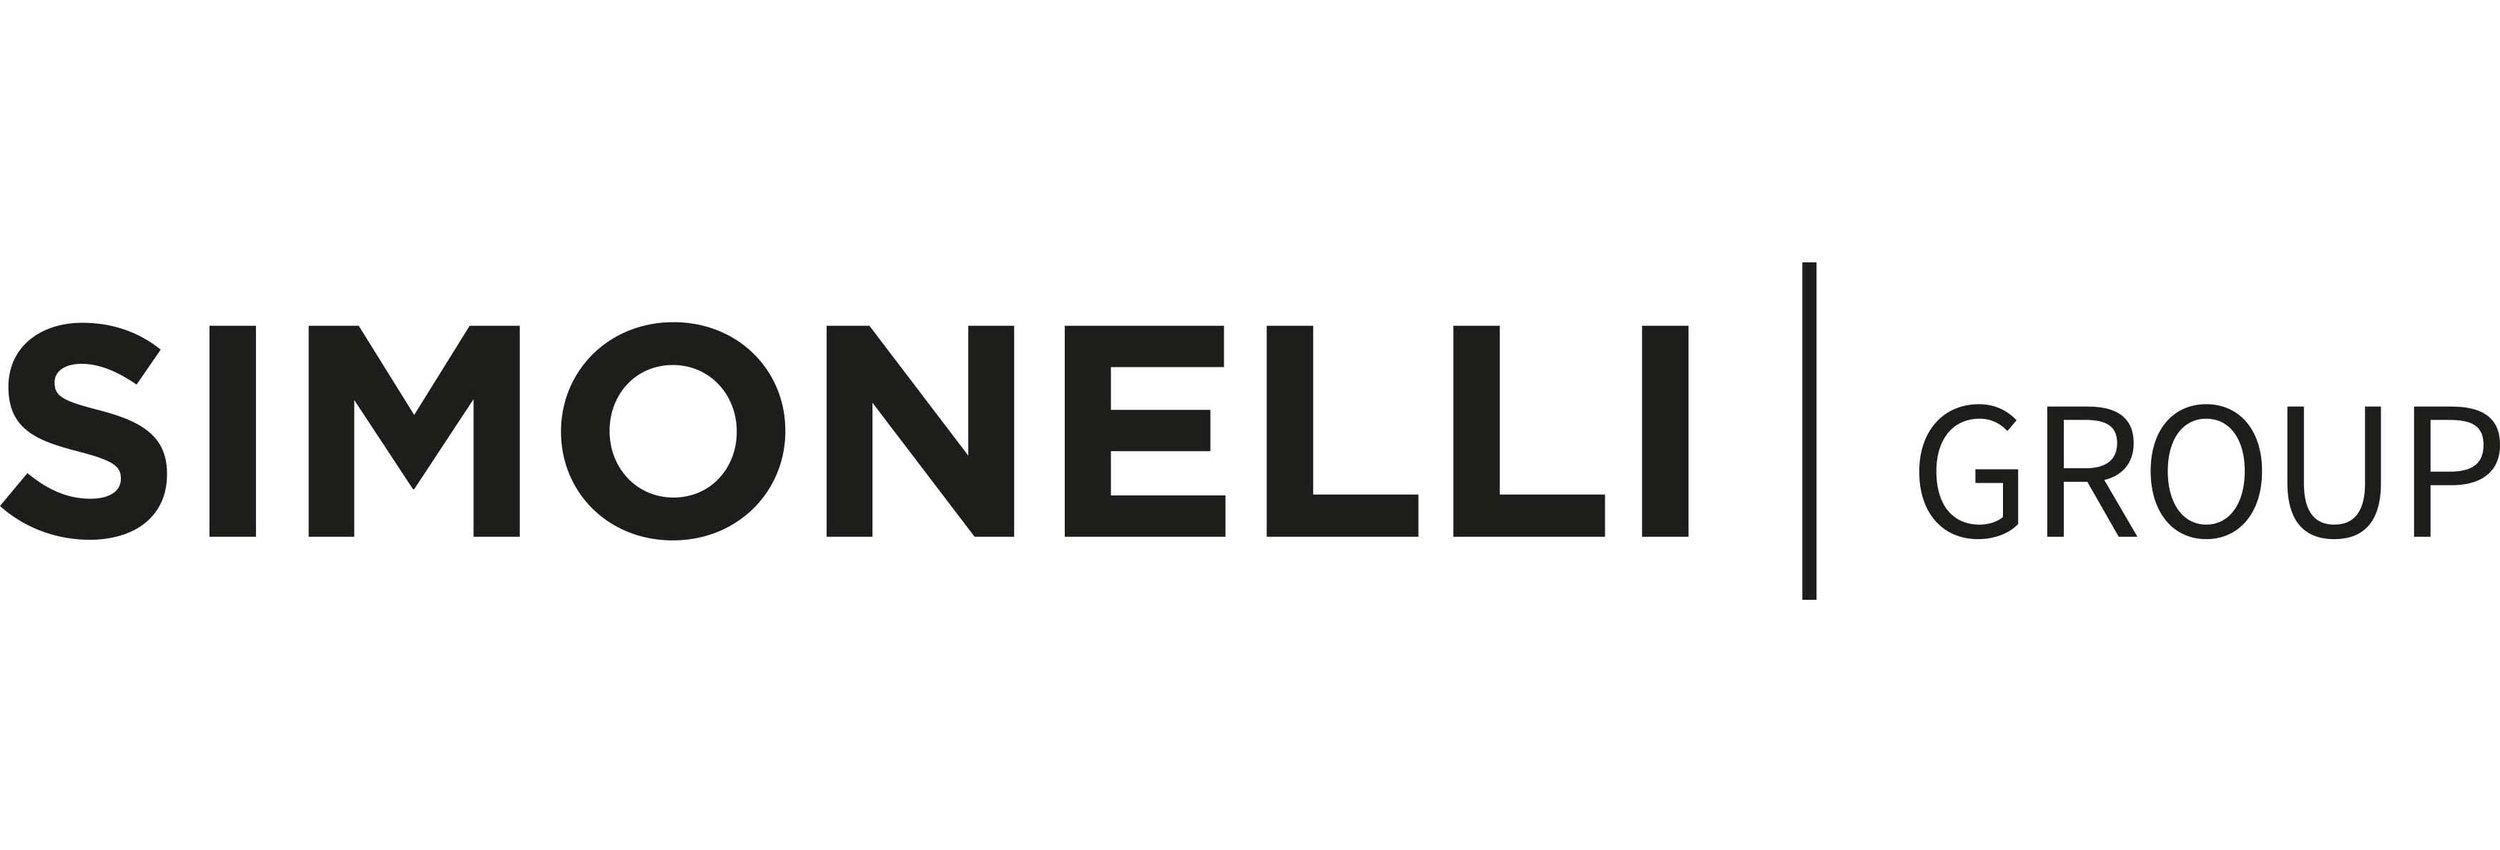 logo-simonelli-group-web.jpg